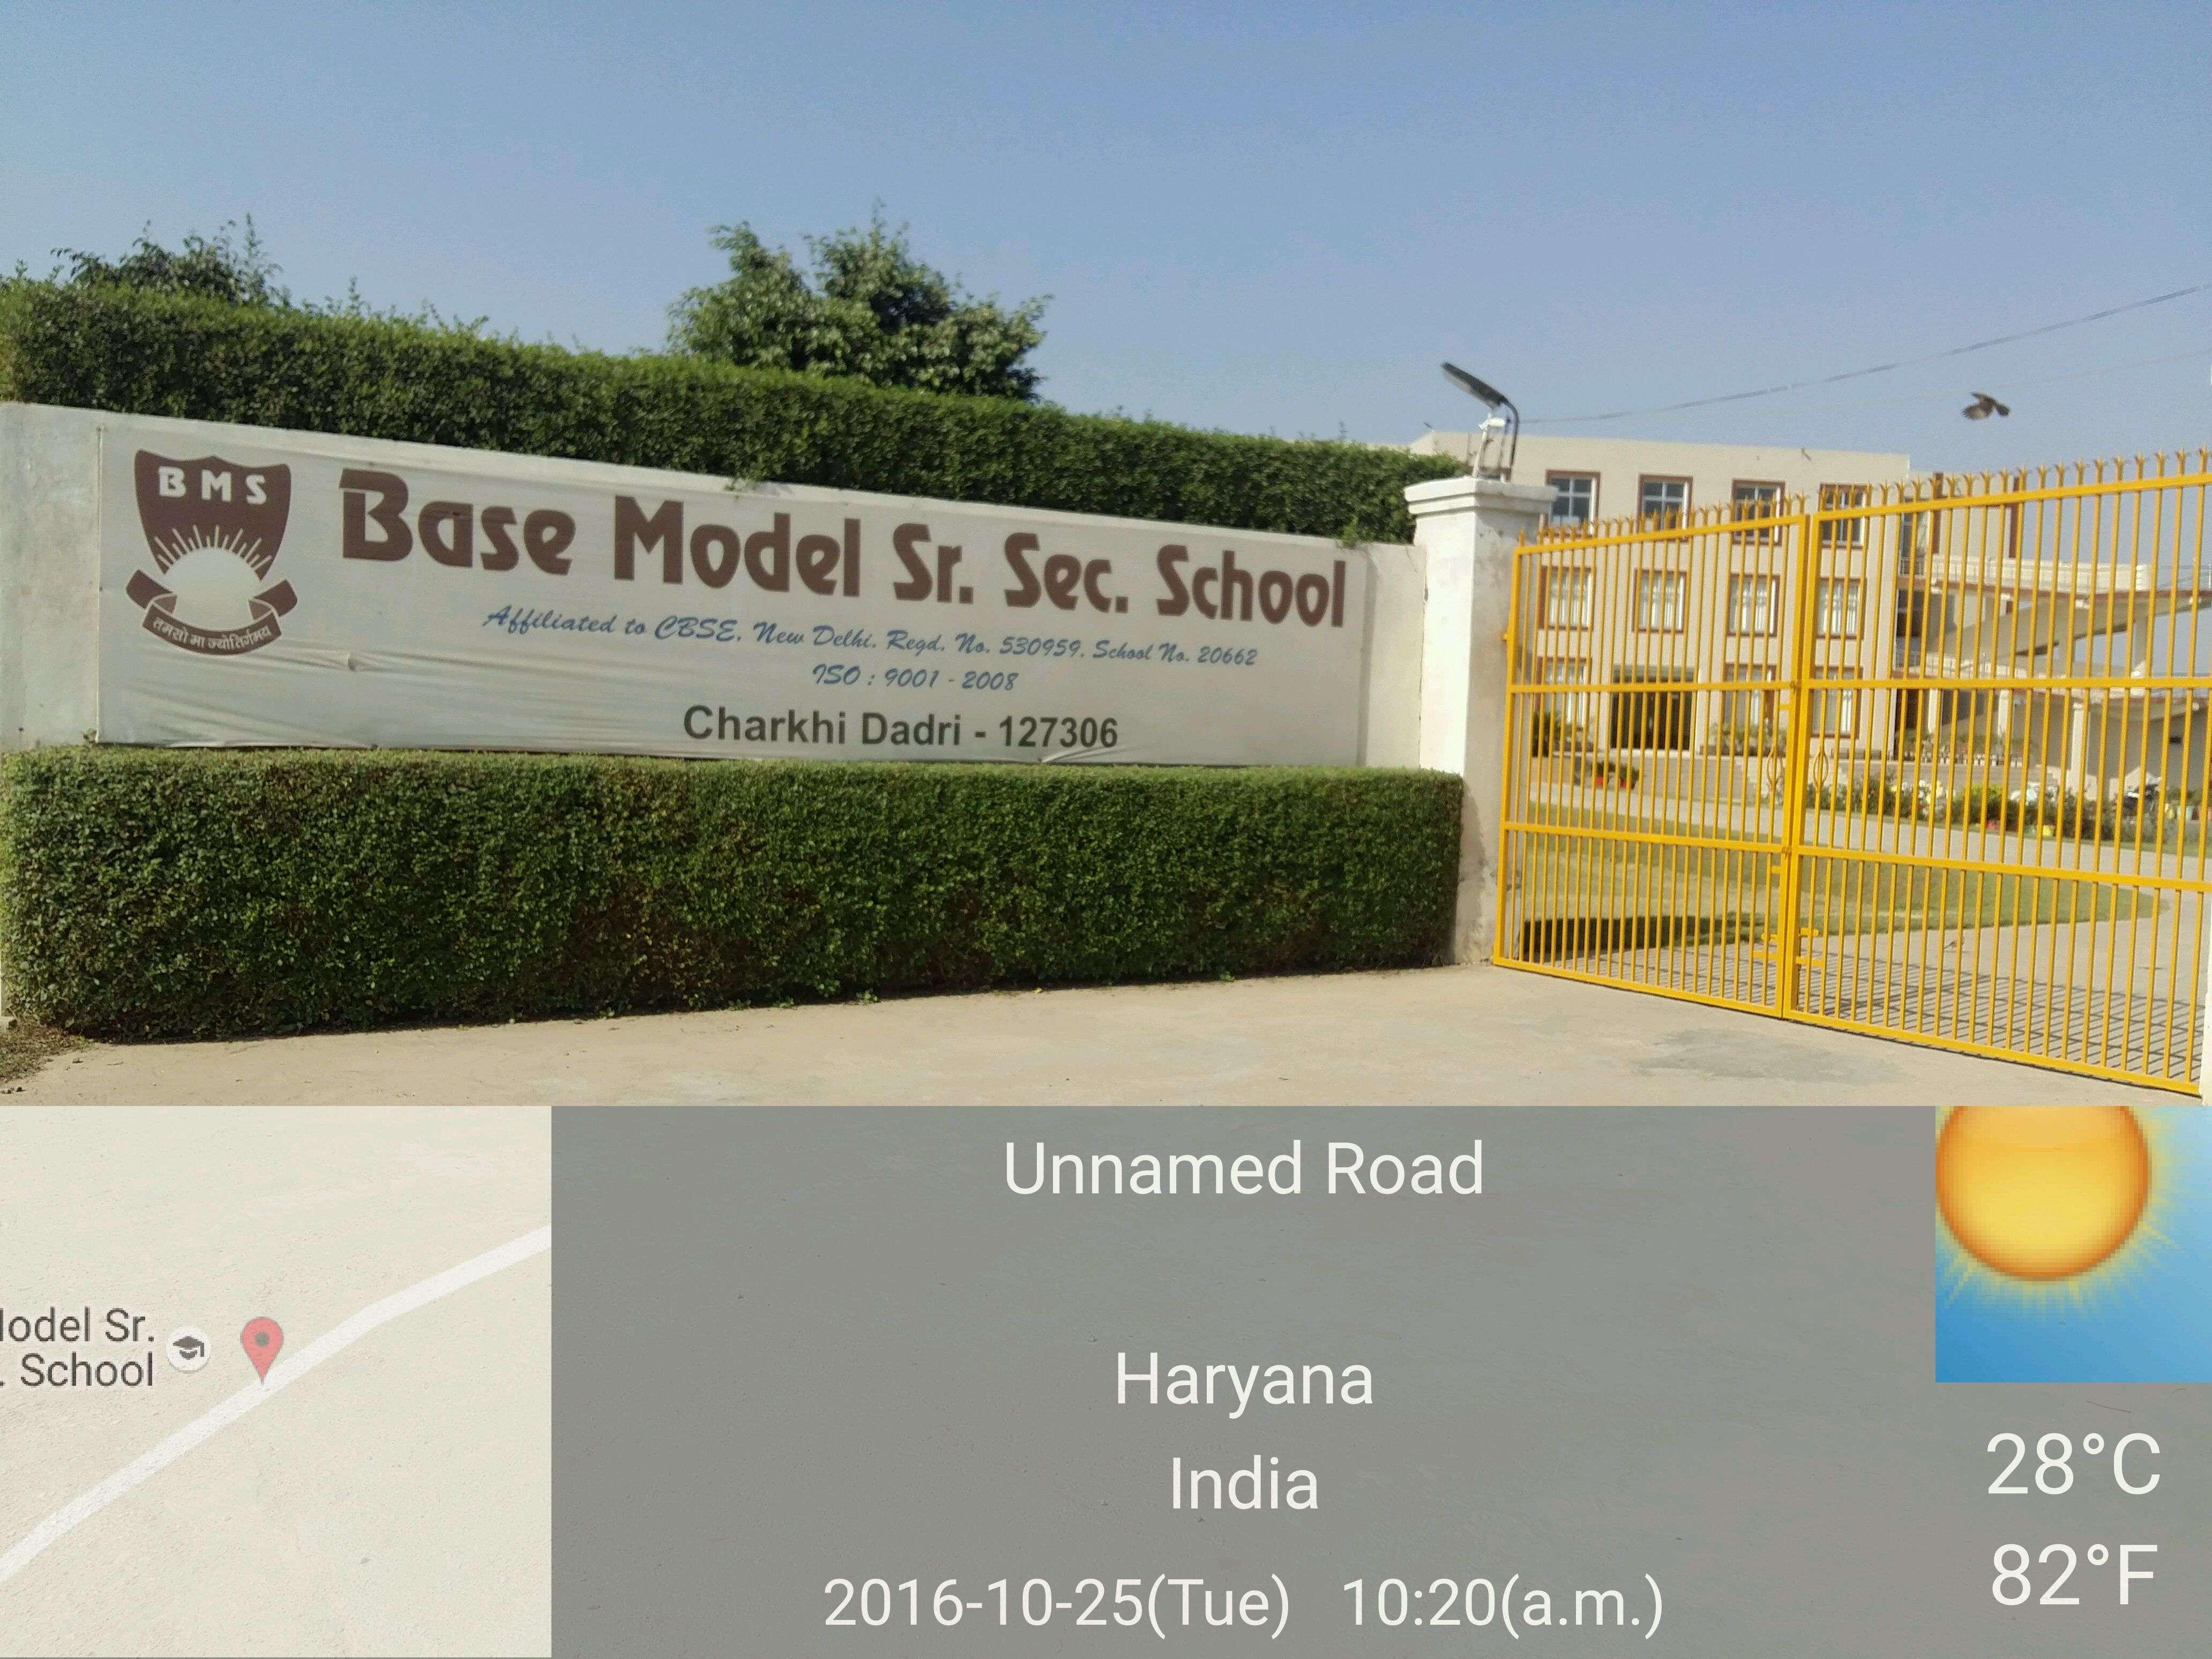 base model senior secondary school kalyana road 530959